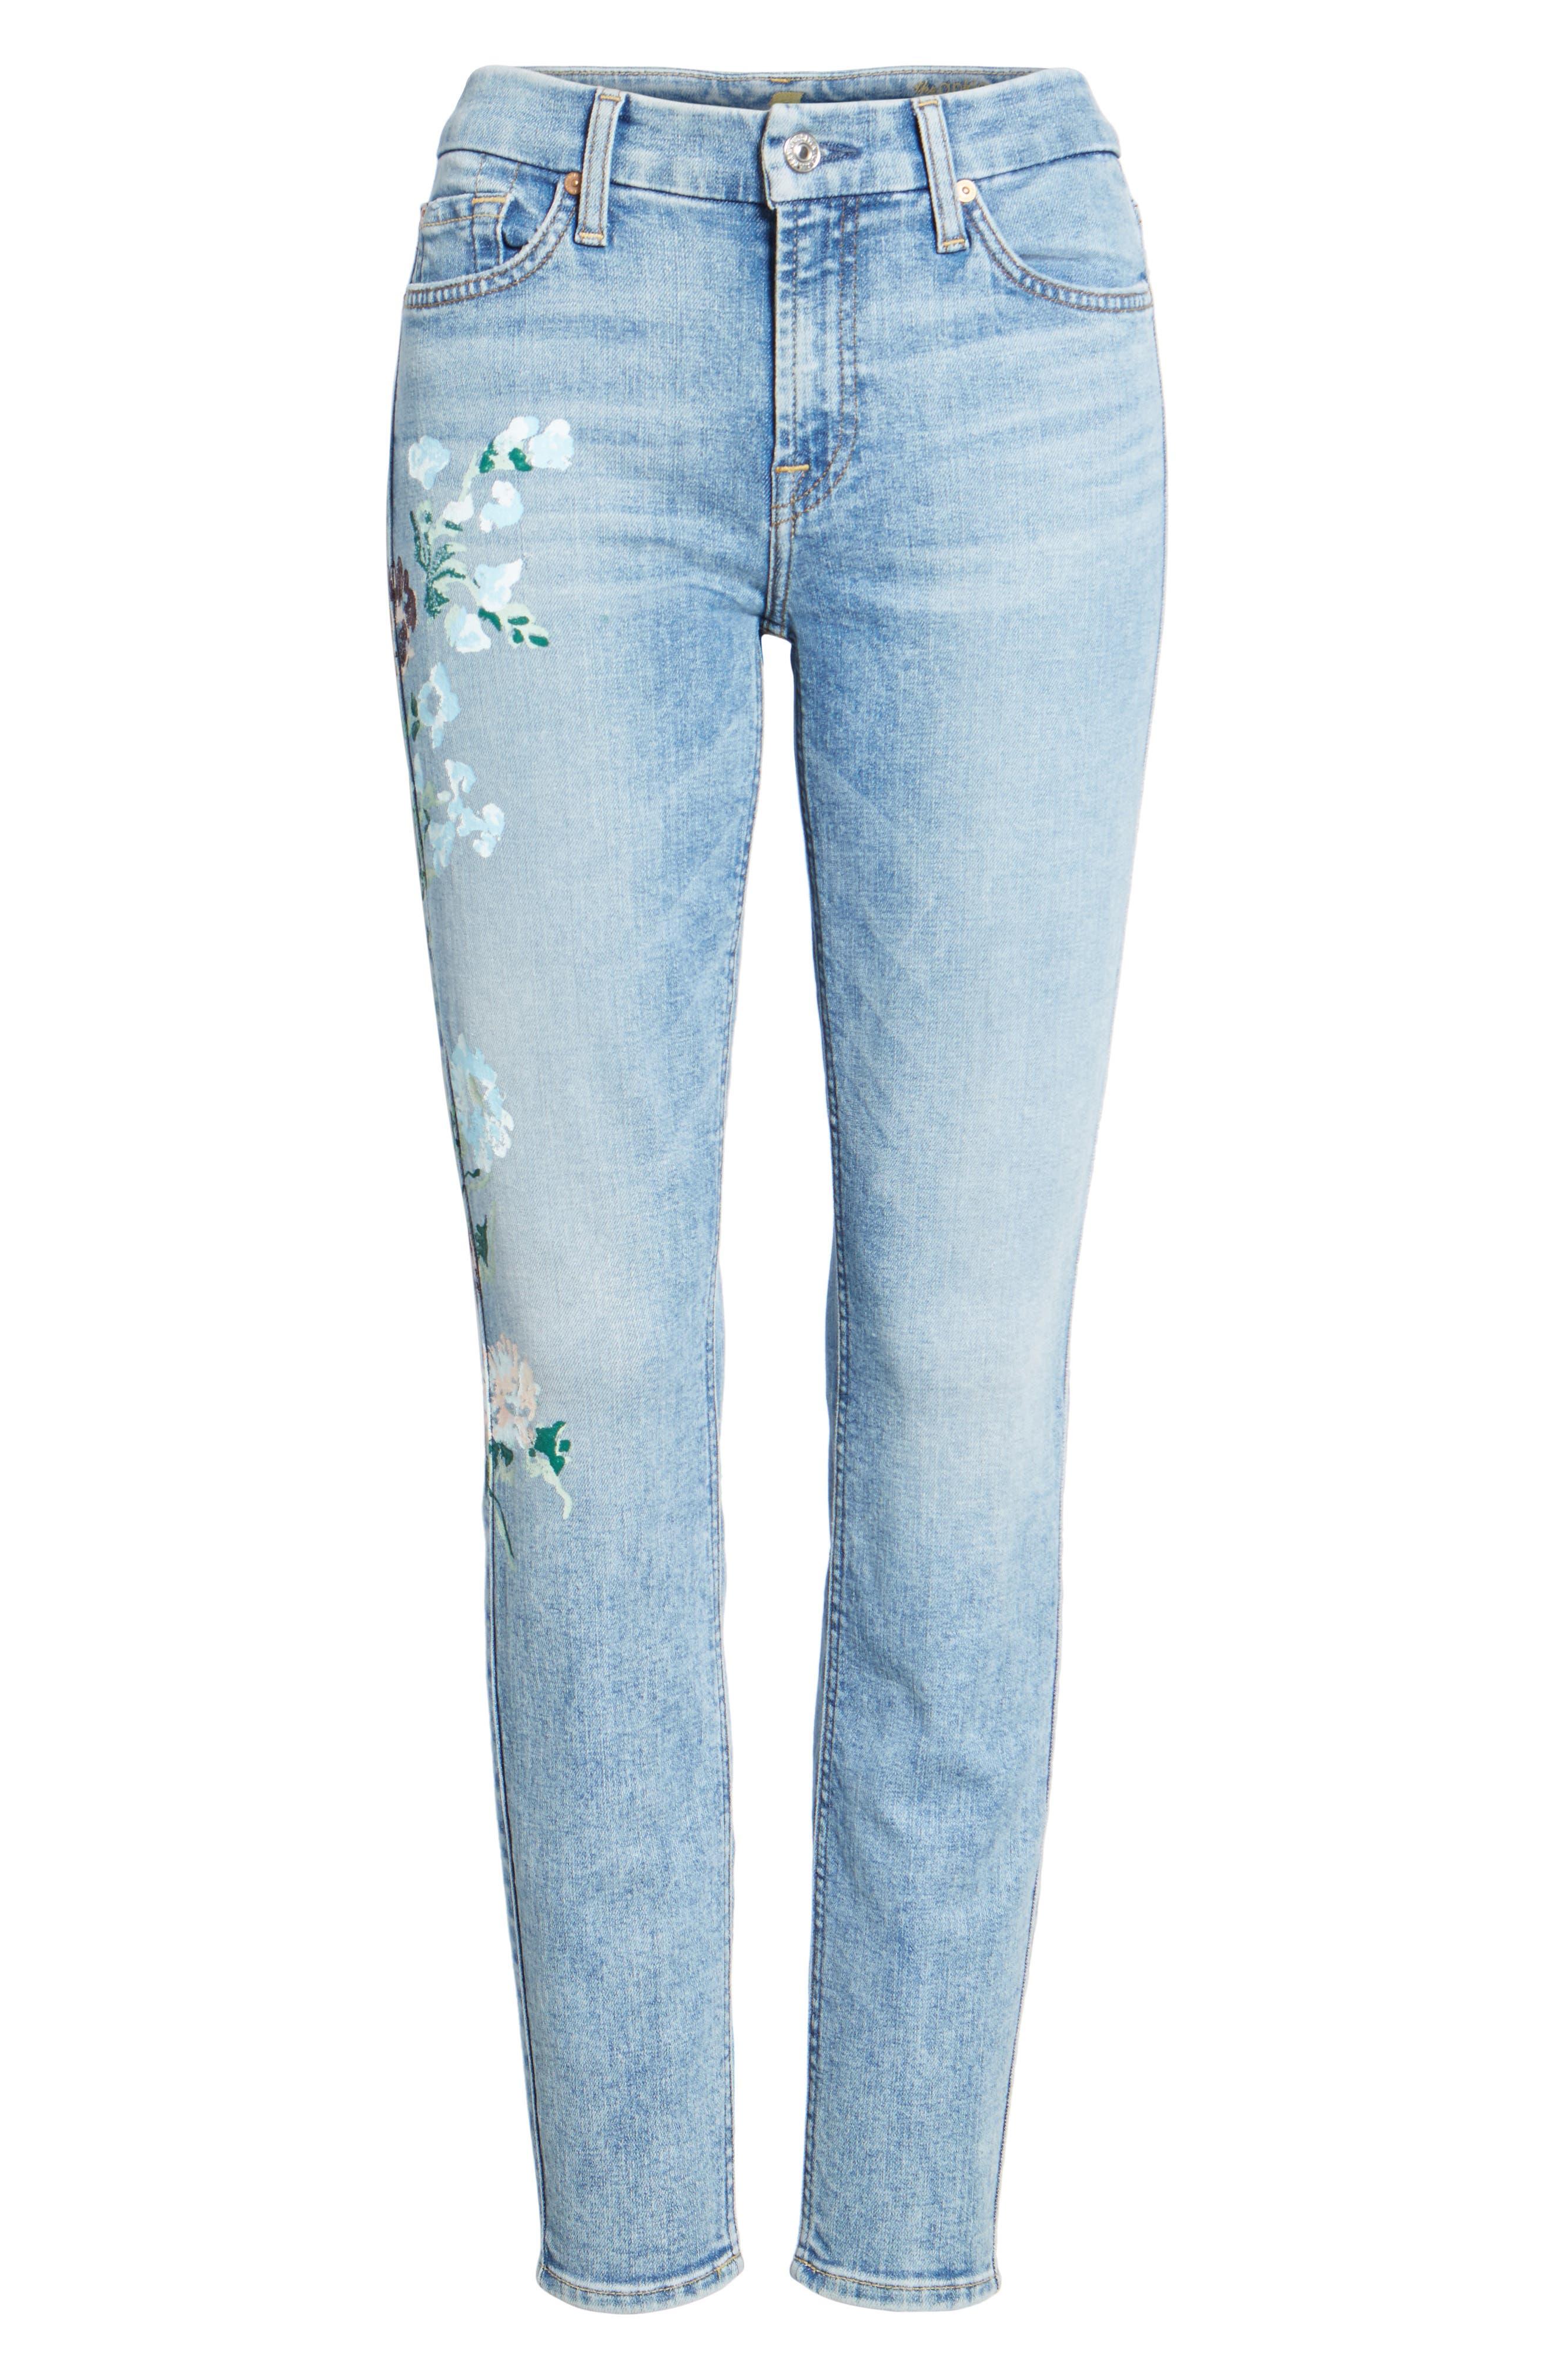 Embellished & Ripped Ankle Skinny Jeans,                             Alternate thumbnail 6, color,                             Radiant Wythe W/ Floral